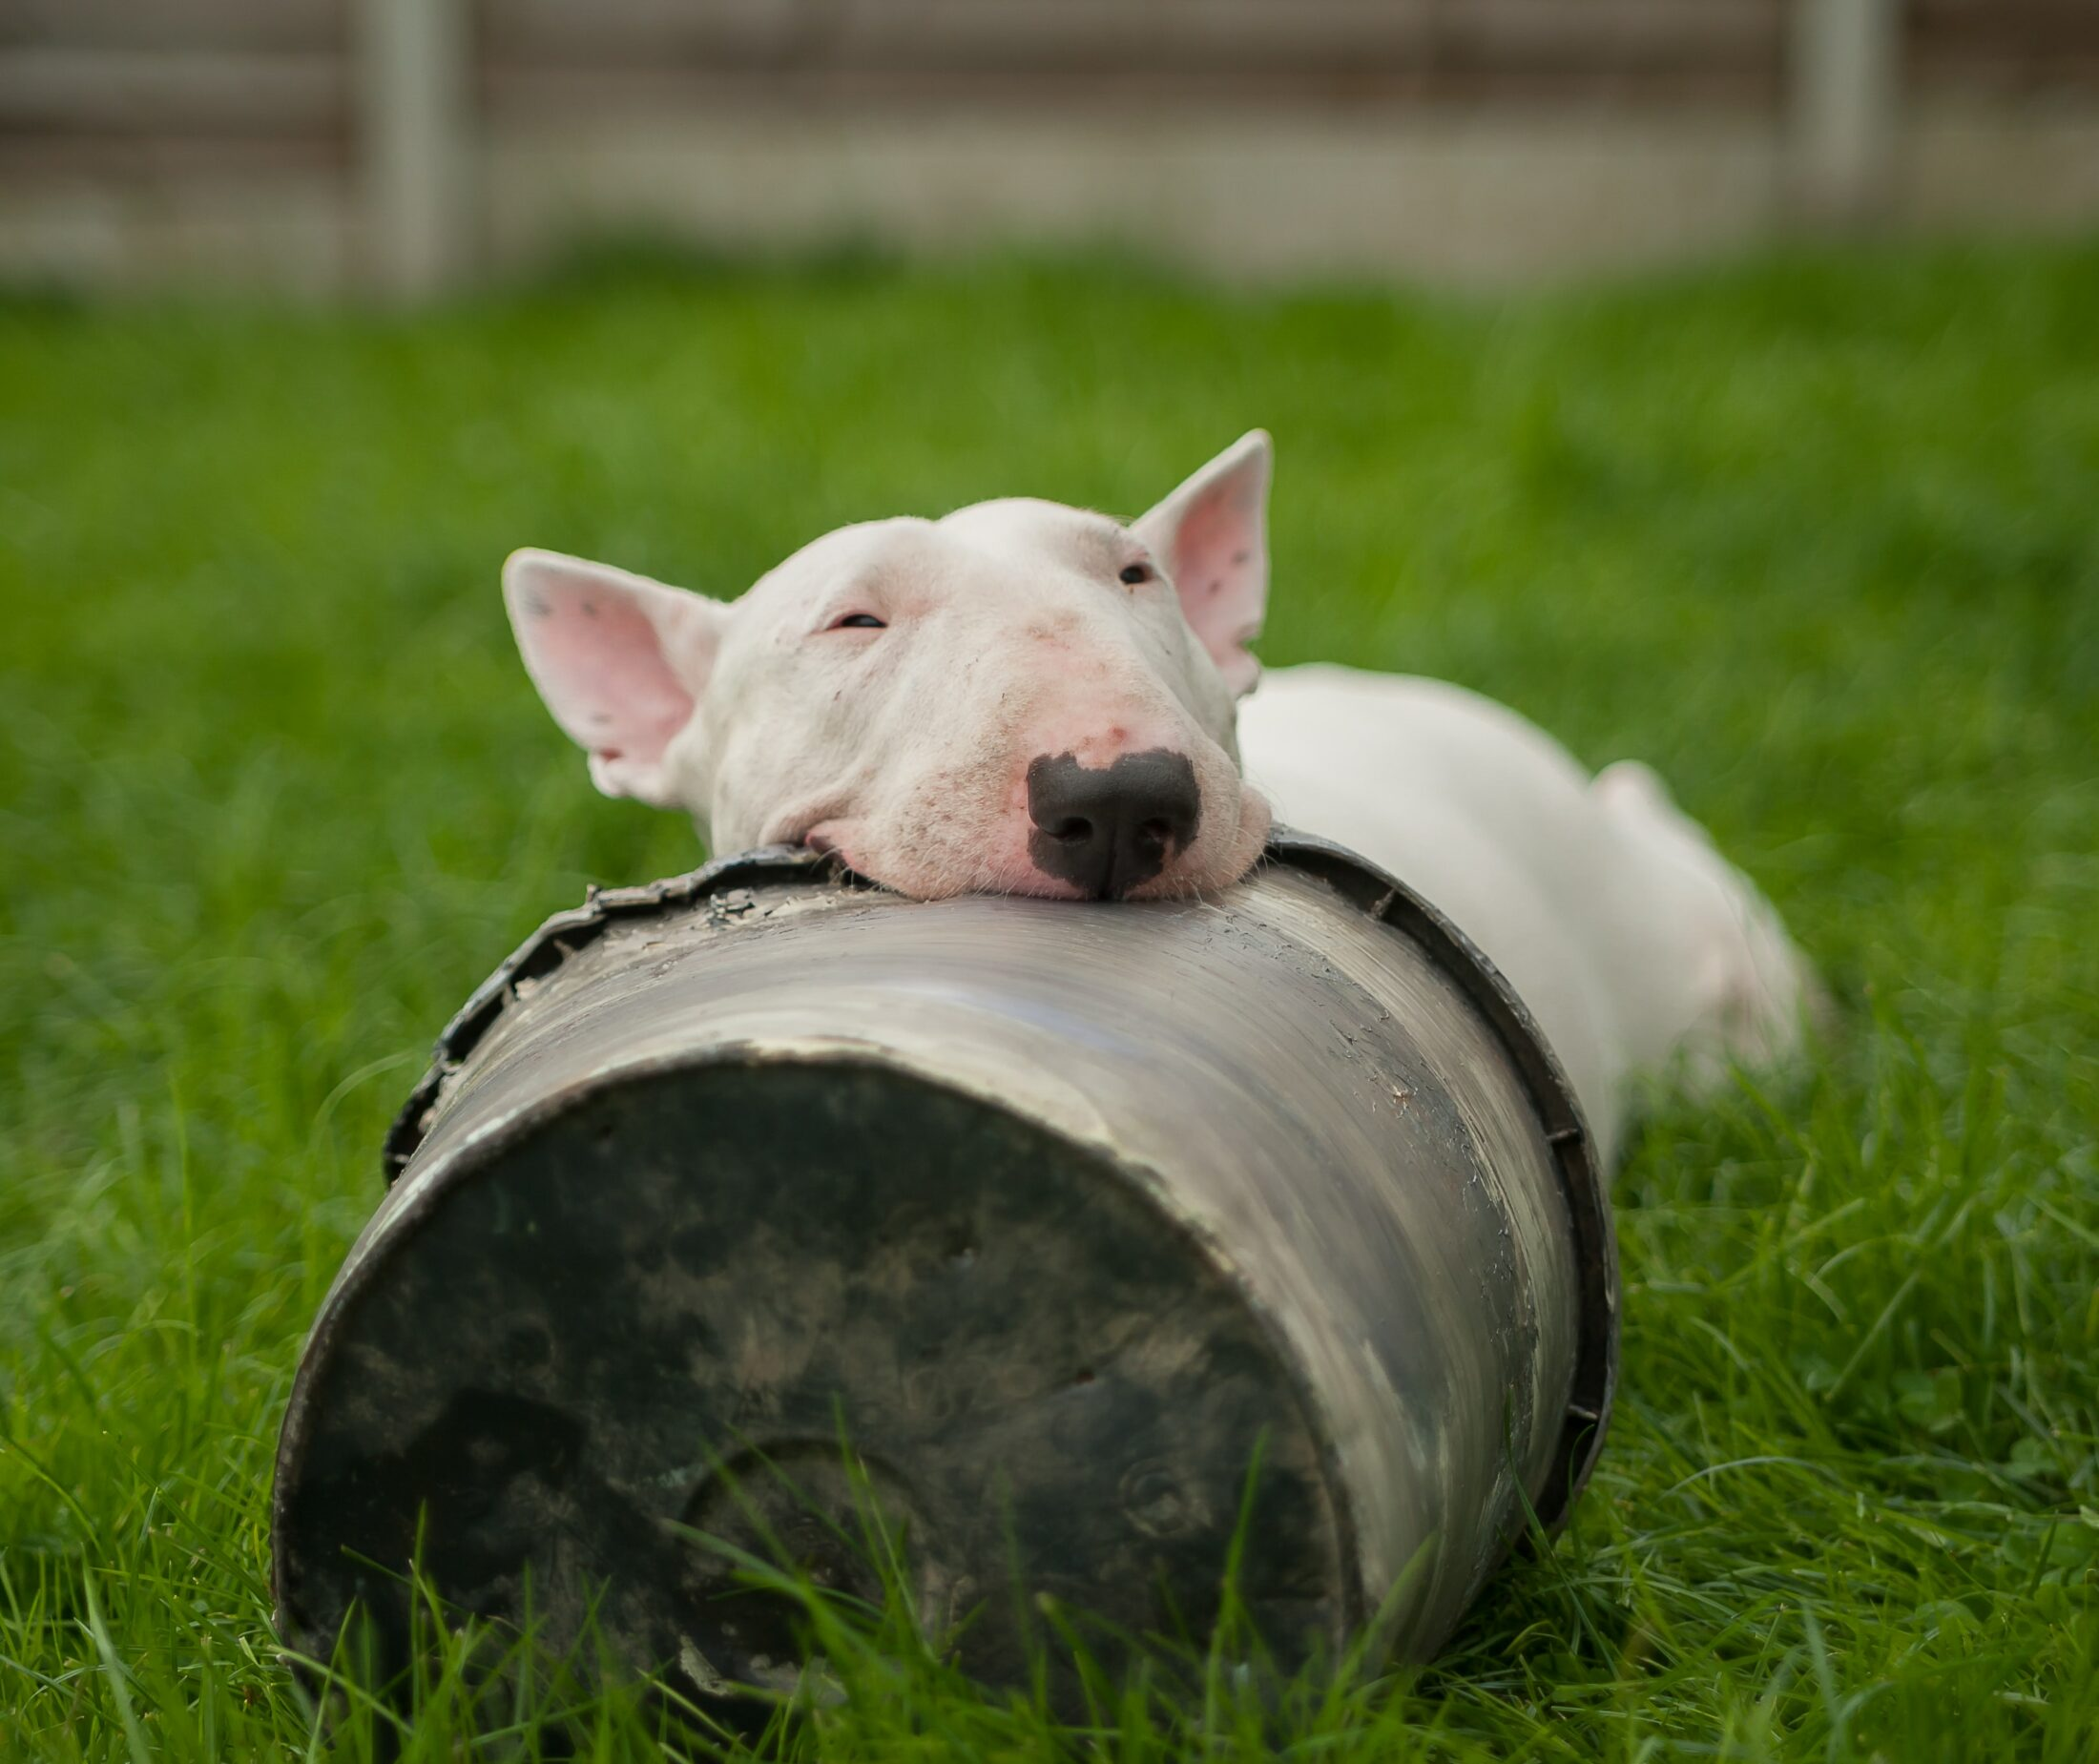 cachorro ocm olho azul - bull terrier